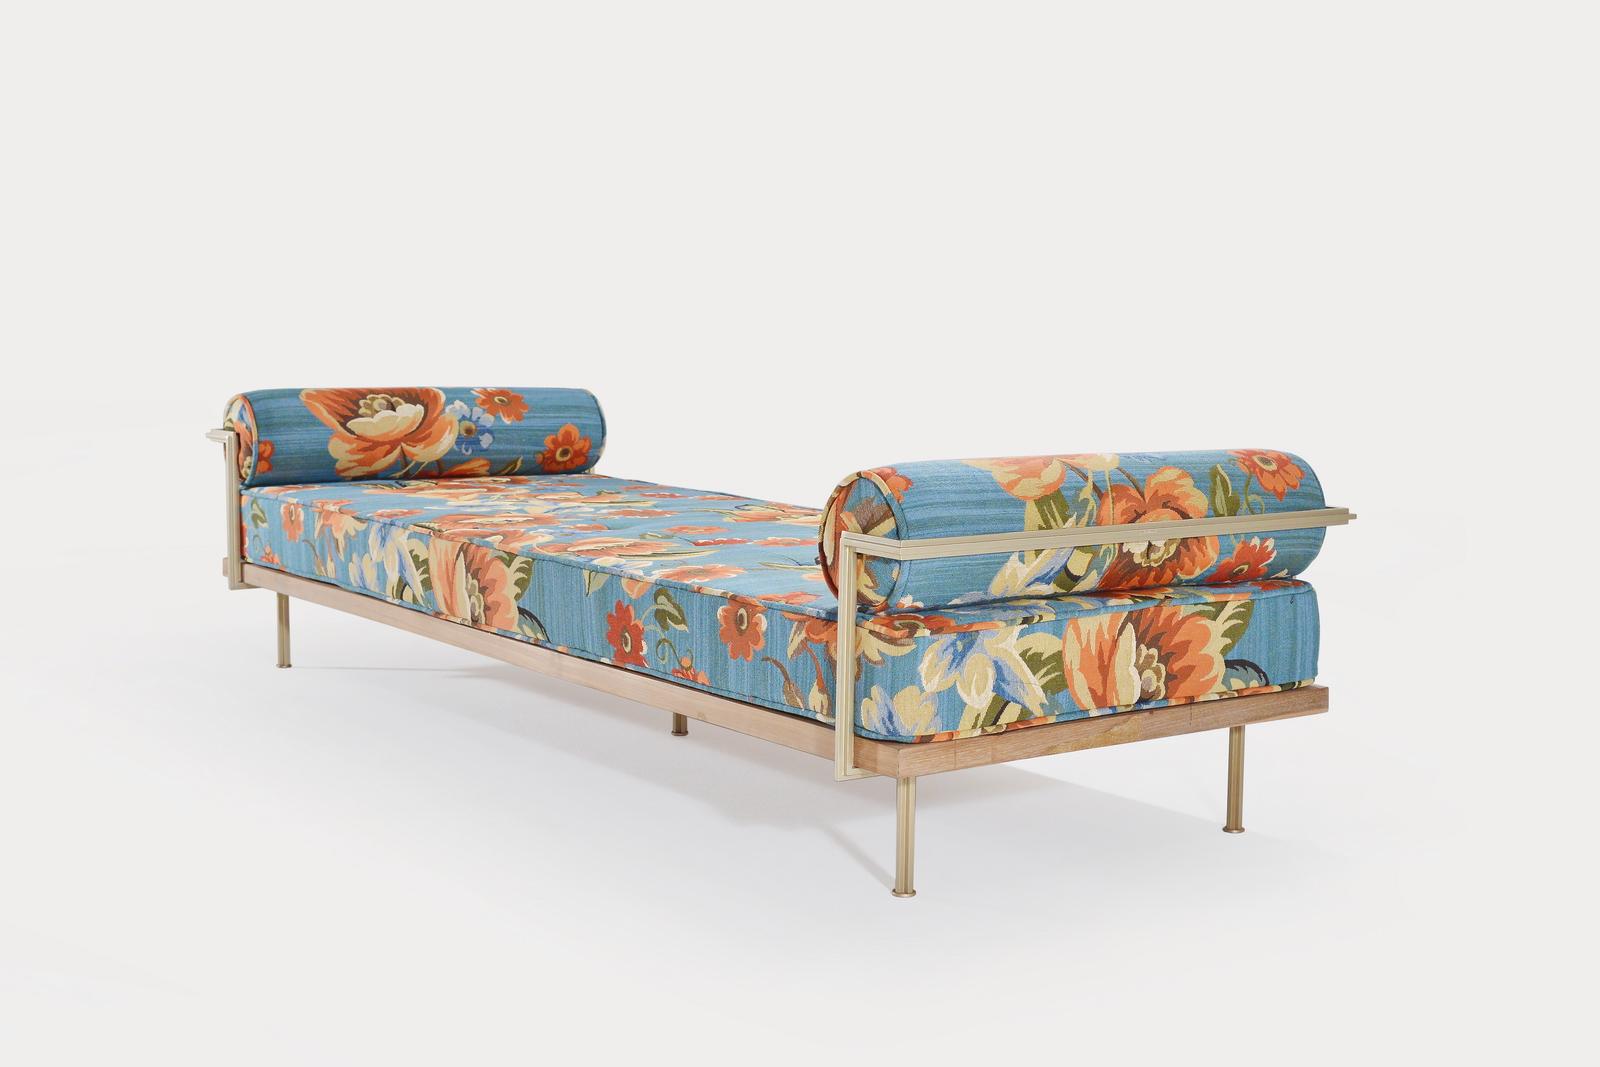 PTendercool-Sofa-PT76-BS1-TE-NO-JD&CO (Garden Tapestry)-190903-01